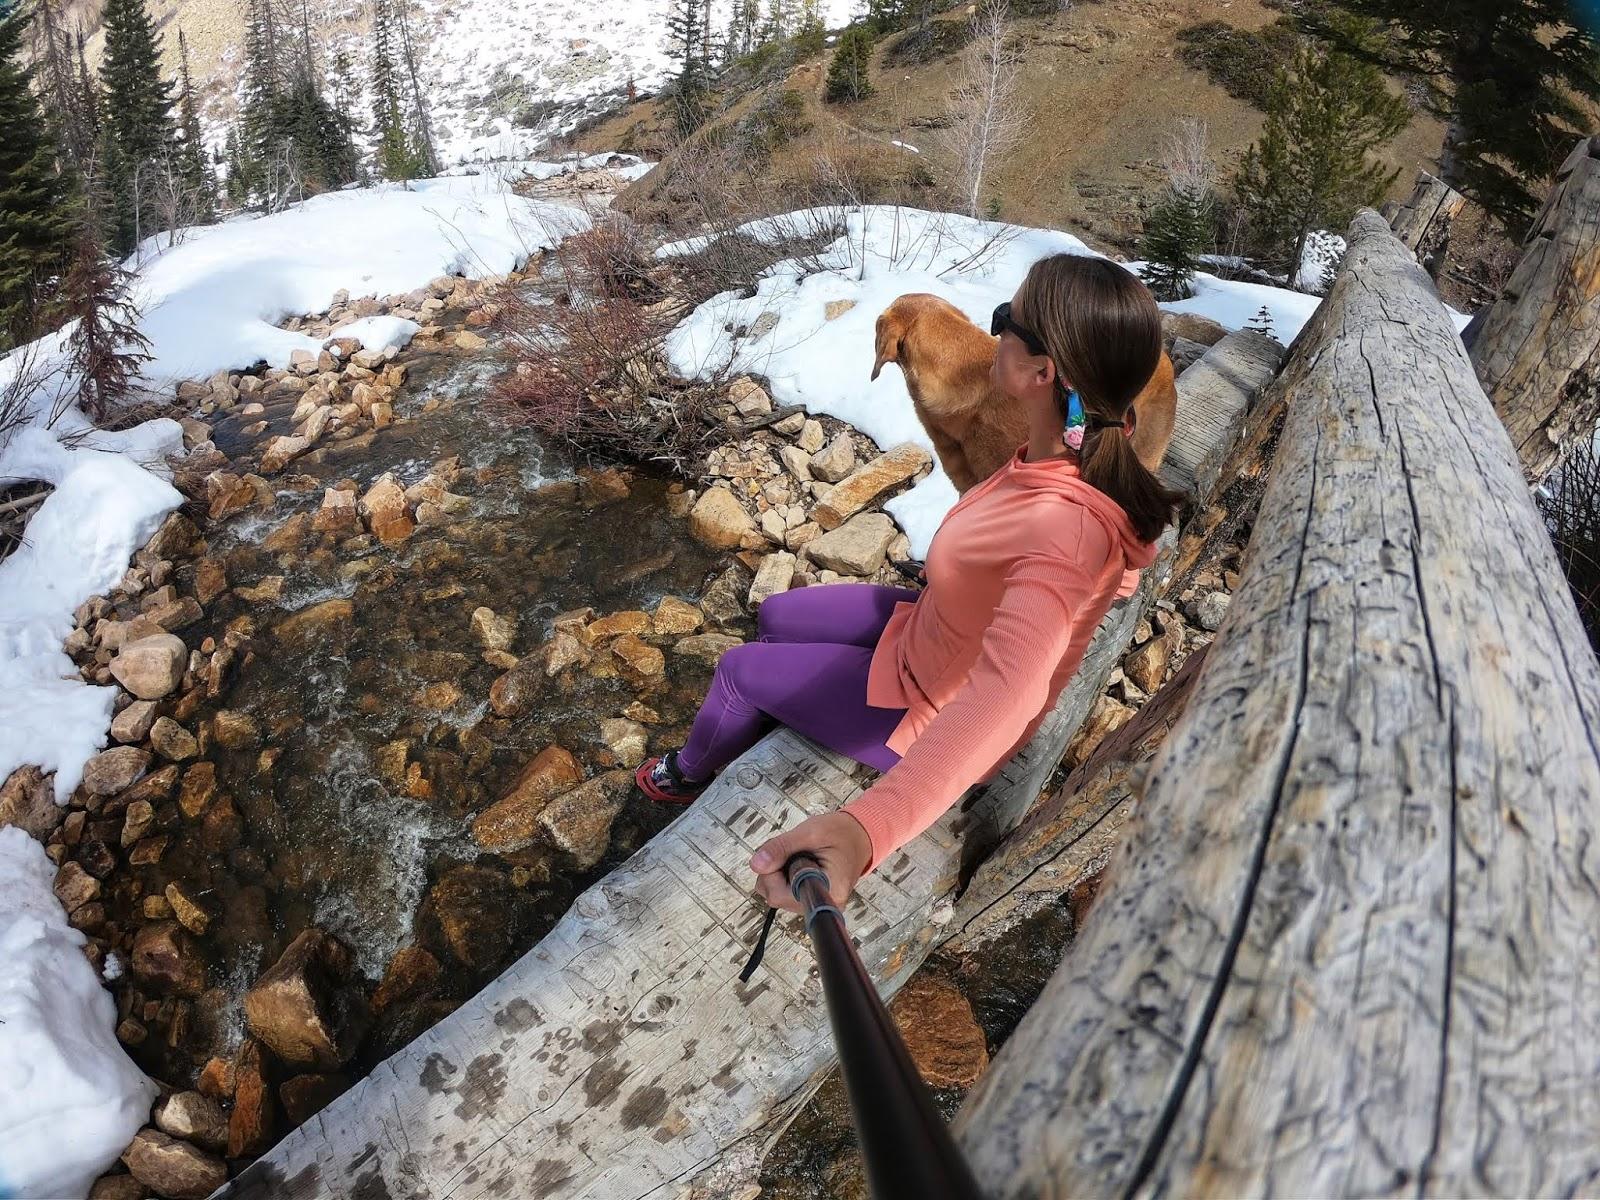 Backpacking the Shingle Creek Trail, Uintas, Backpacking in the Uintas, Backpacking with Dogs in Utah